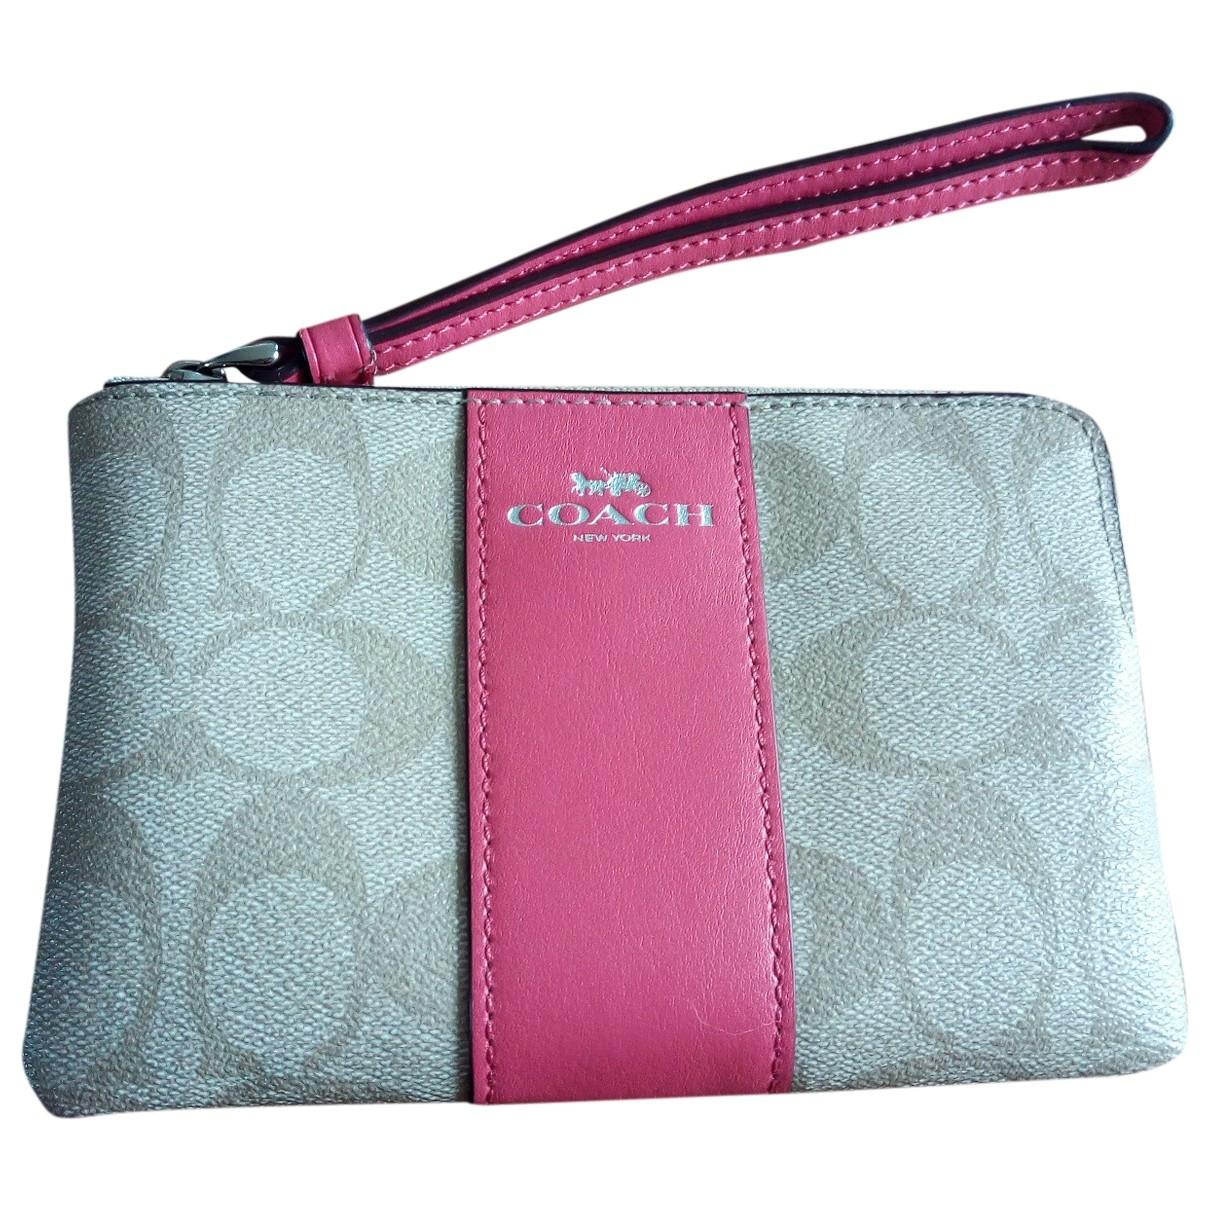 Coach \N Beige Leather Clutch bag for Women \N